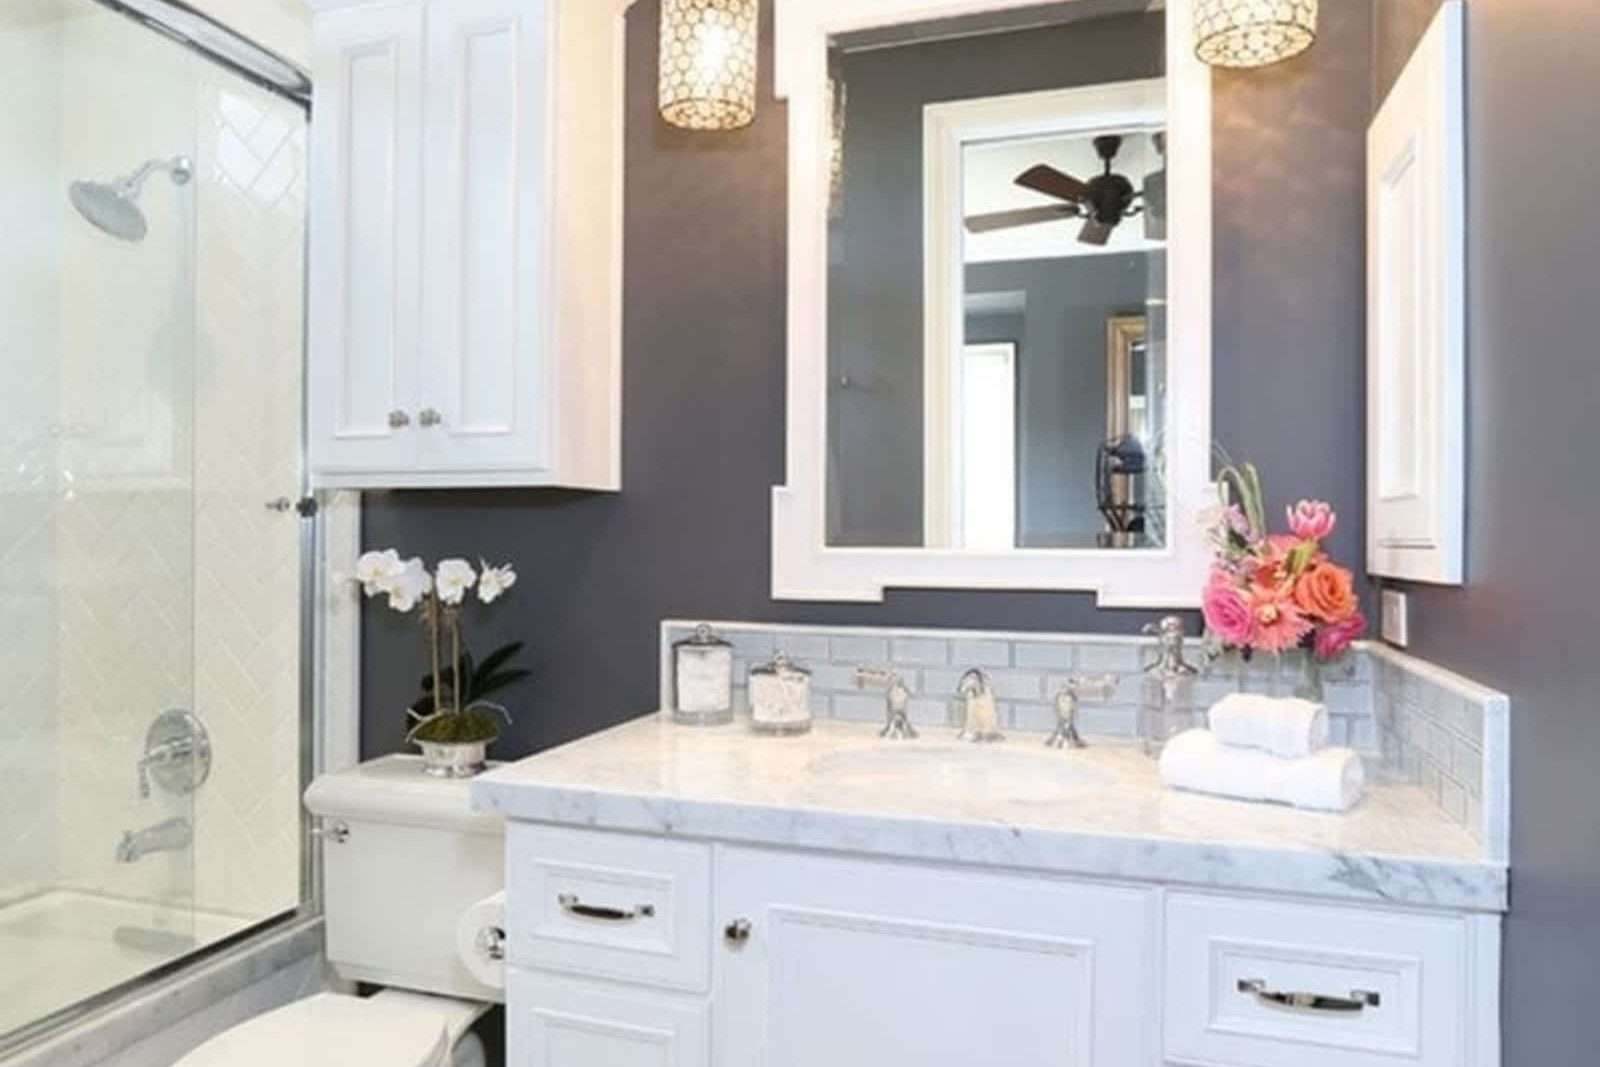 Bathroom Remodel for Less